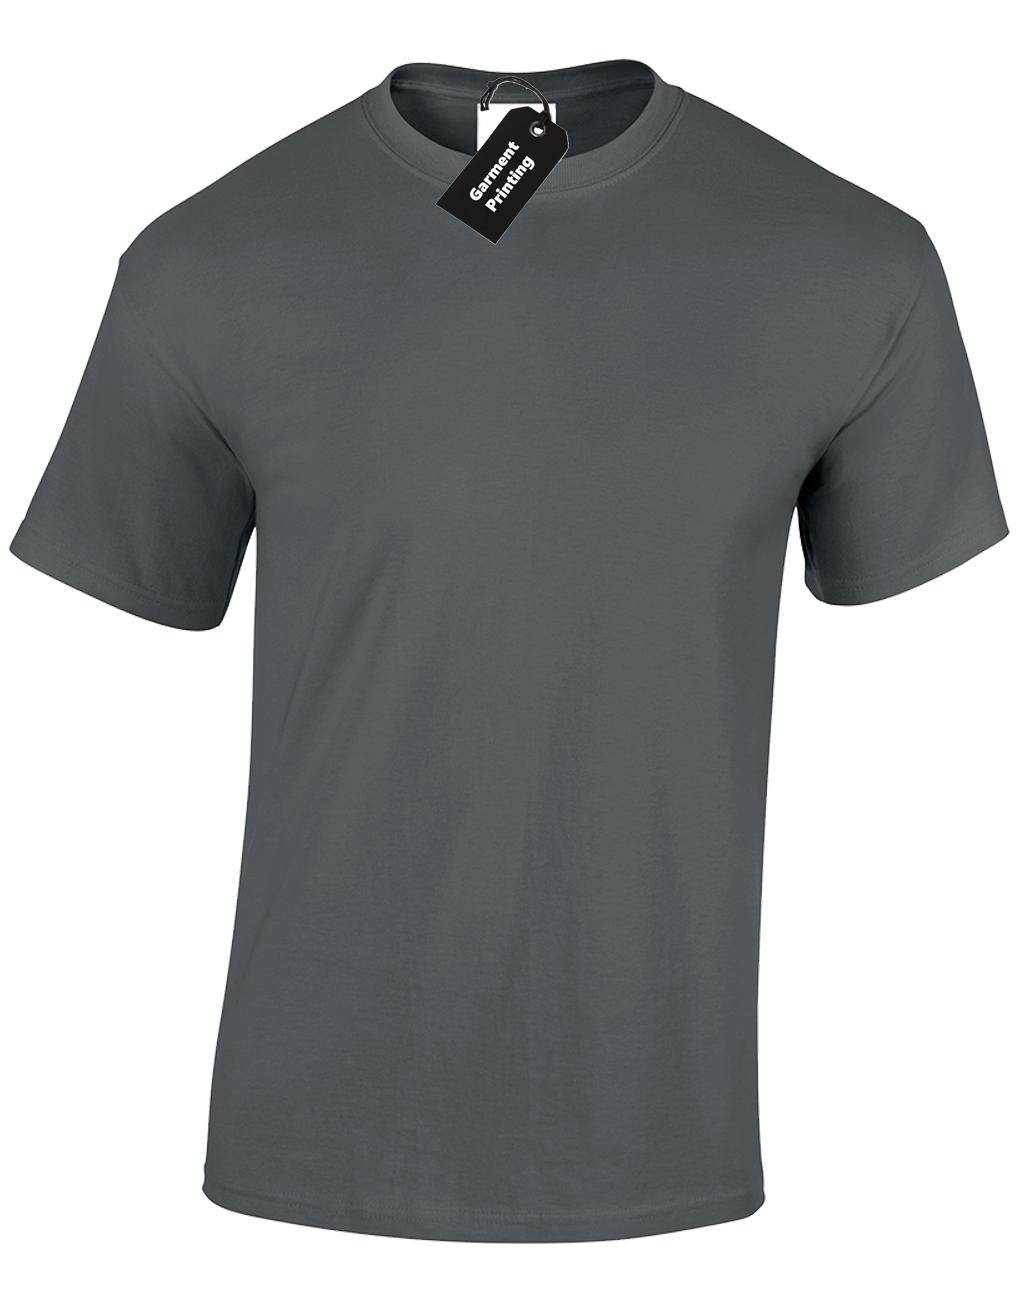 Mens Personalised Printed T-Shirt Unisex Custom Design Logo Uniform Stag Do Fun 10